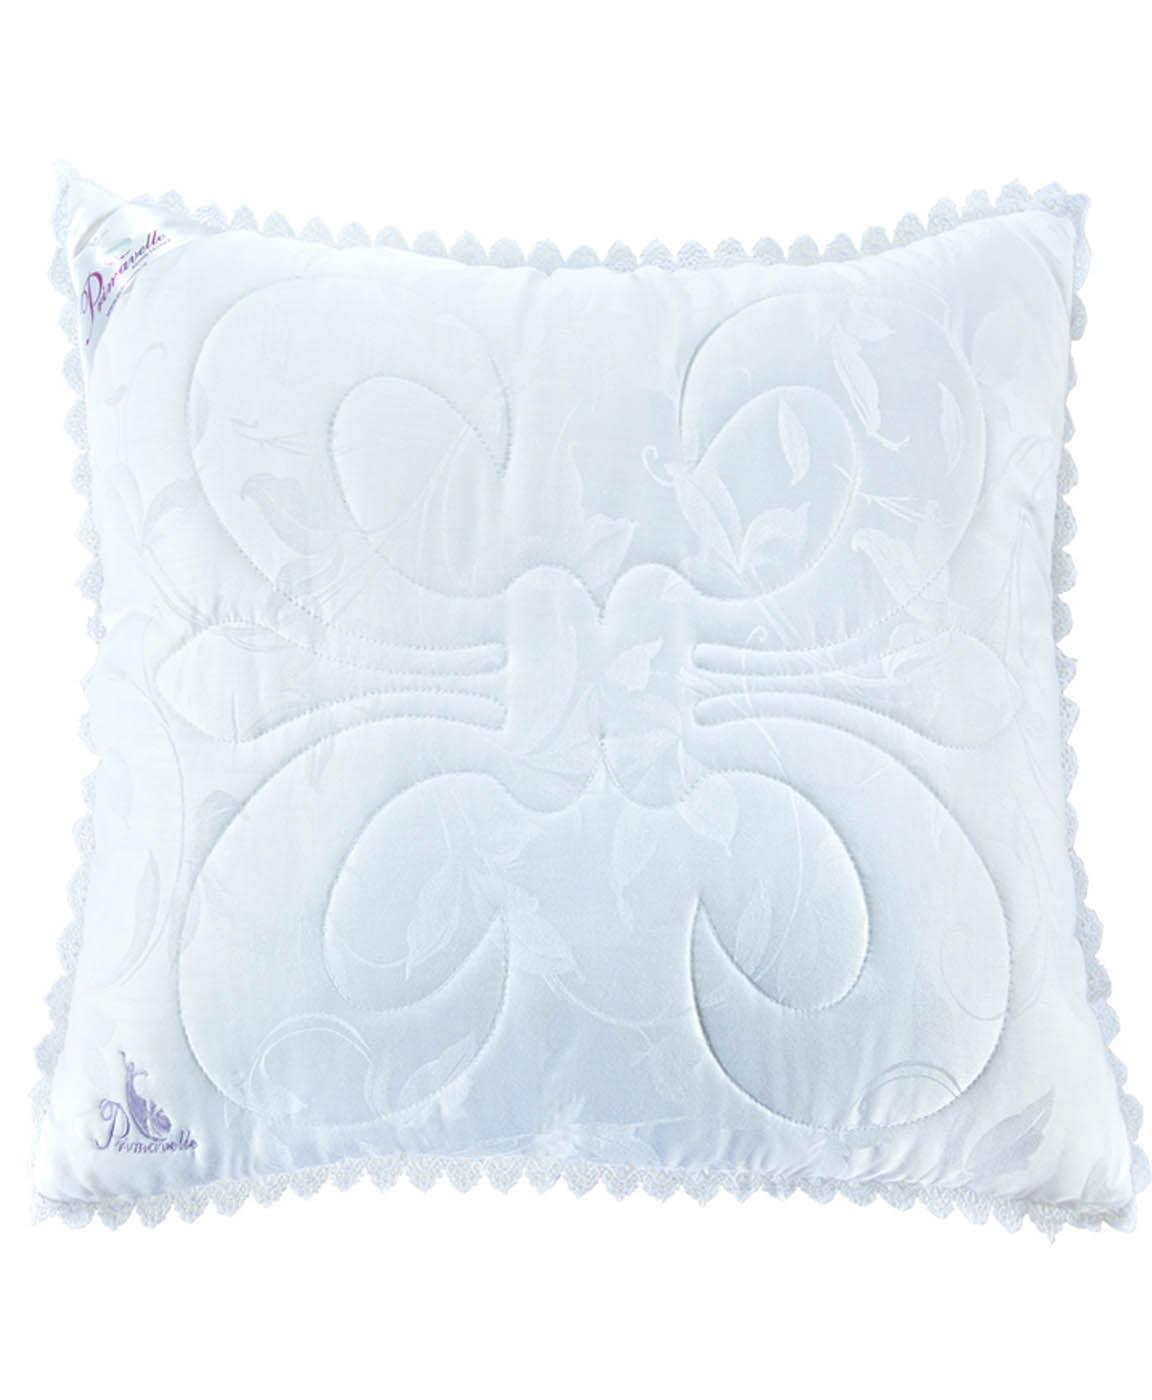 Подушки Primavelle Подушка Silk Premium Цвет: Молочный (70х70) подушки primavelle подушка swan цвет белый 70х70